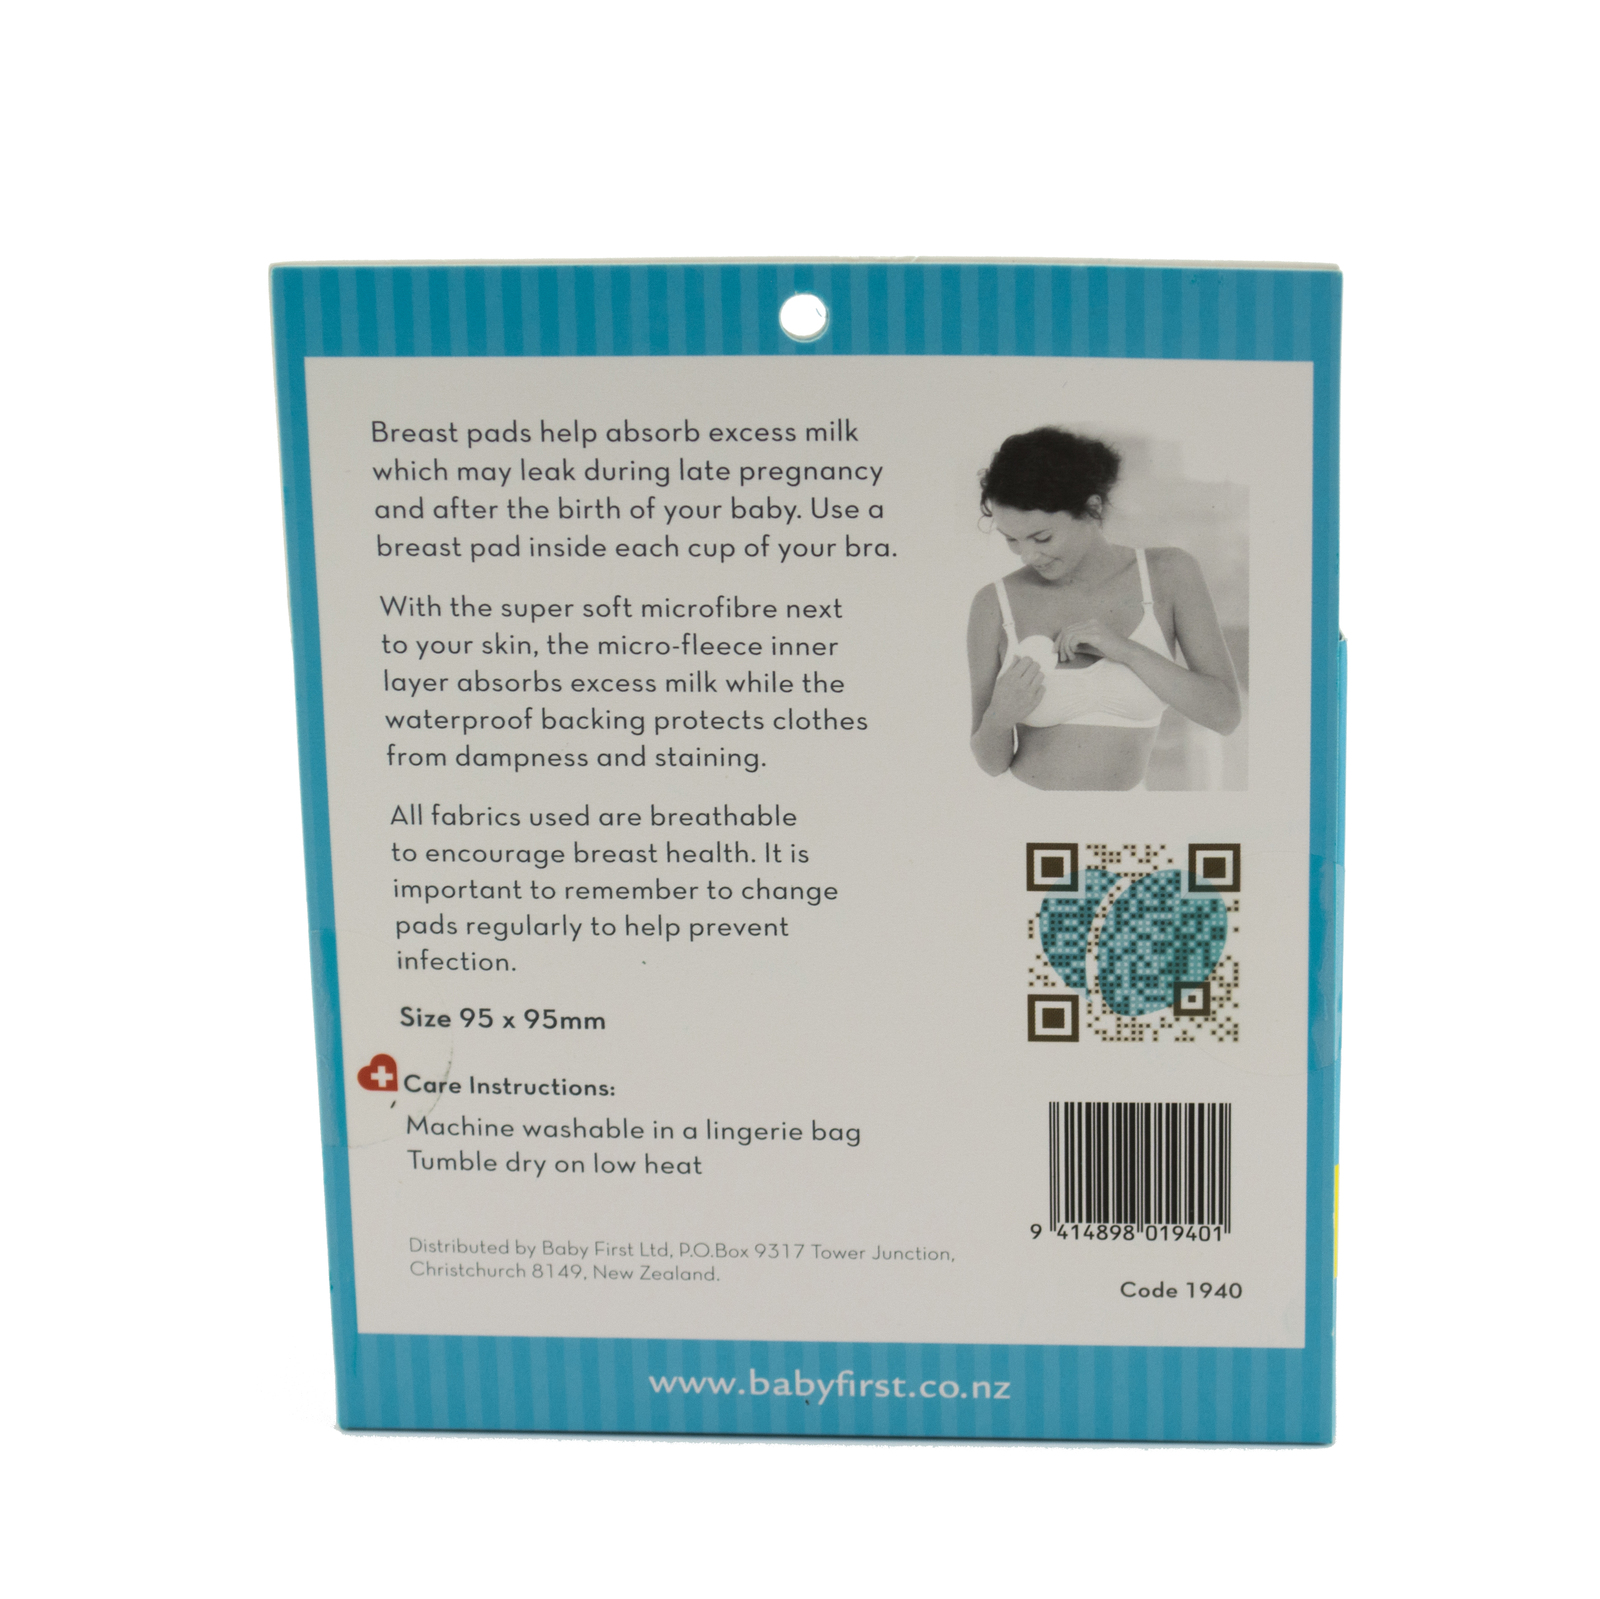 Baby First: Waterproof Breast Pads (6 Pack) image